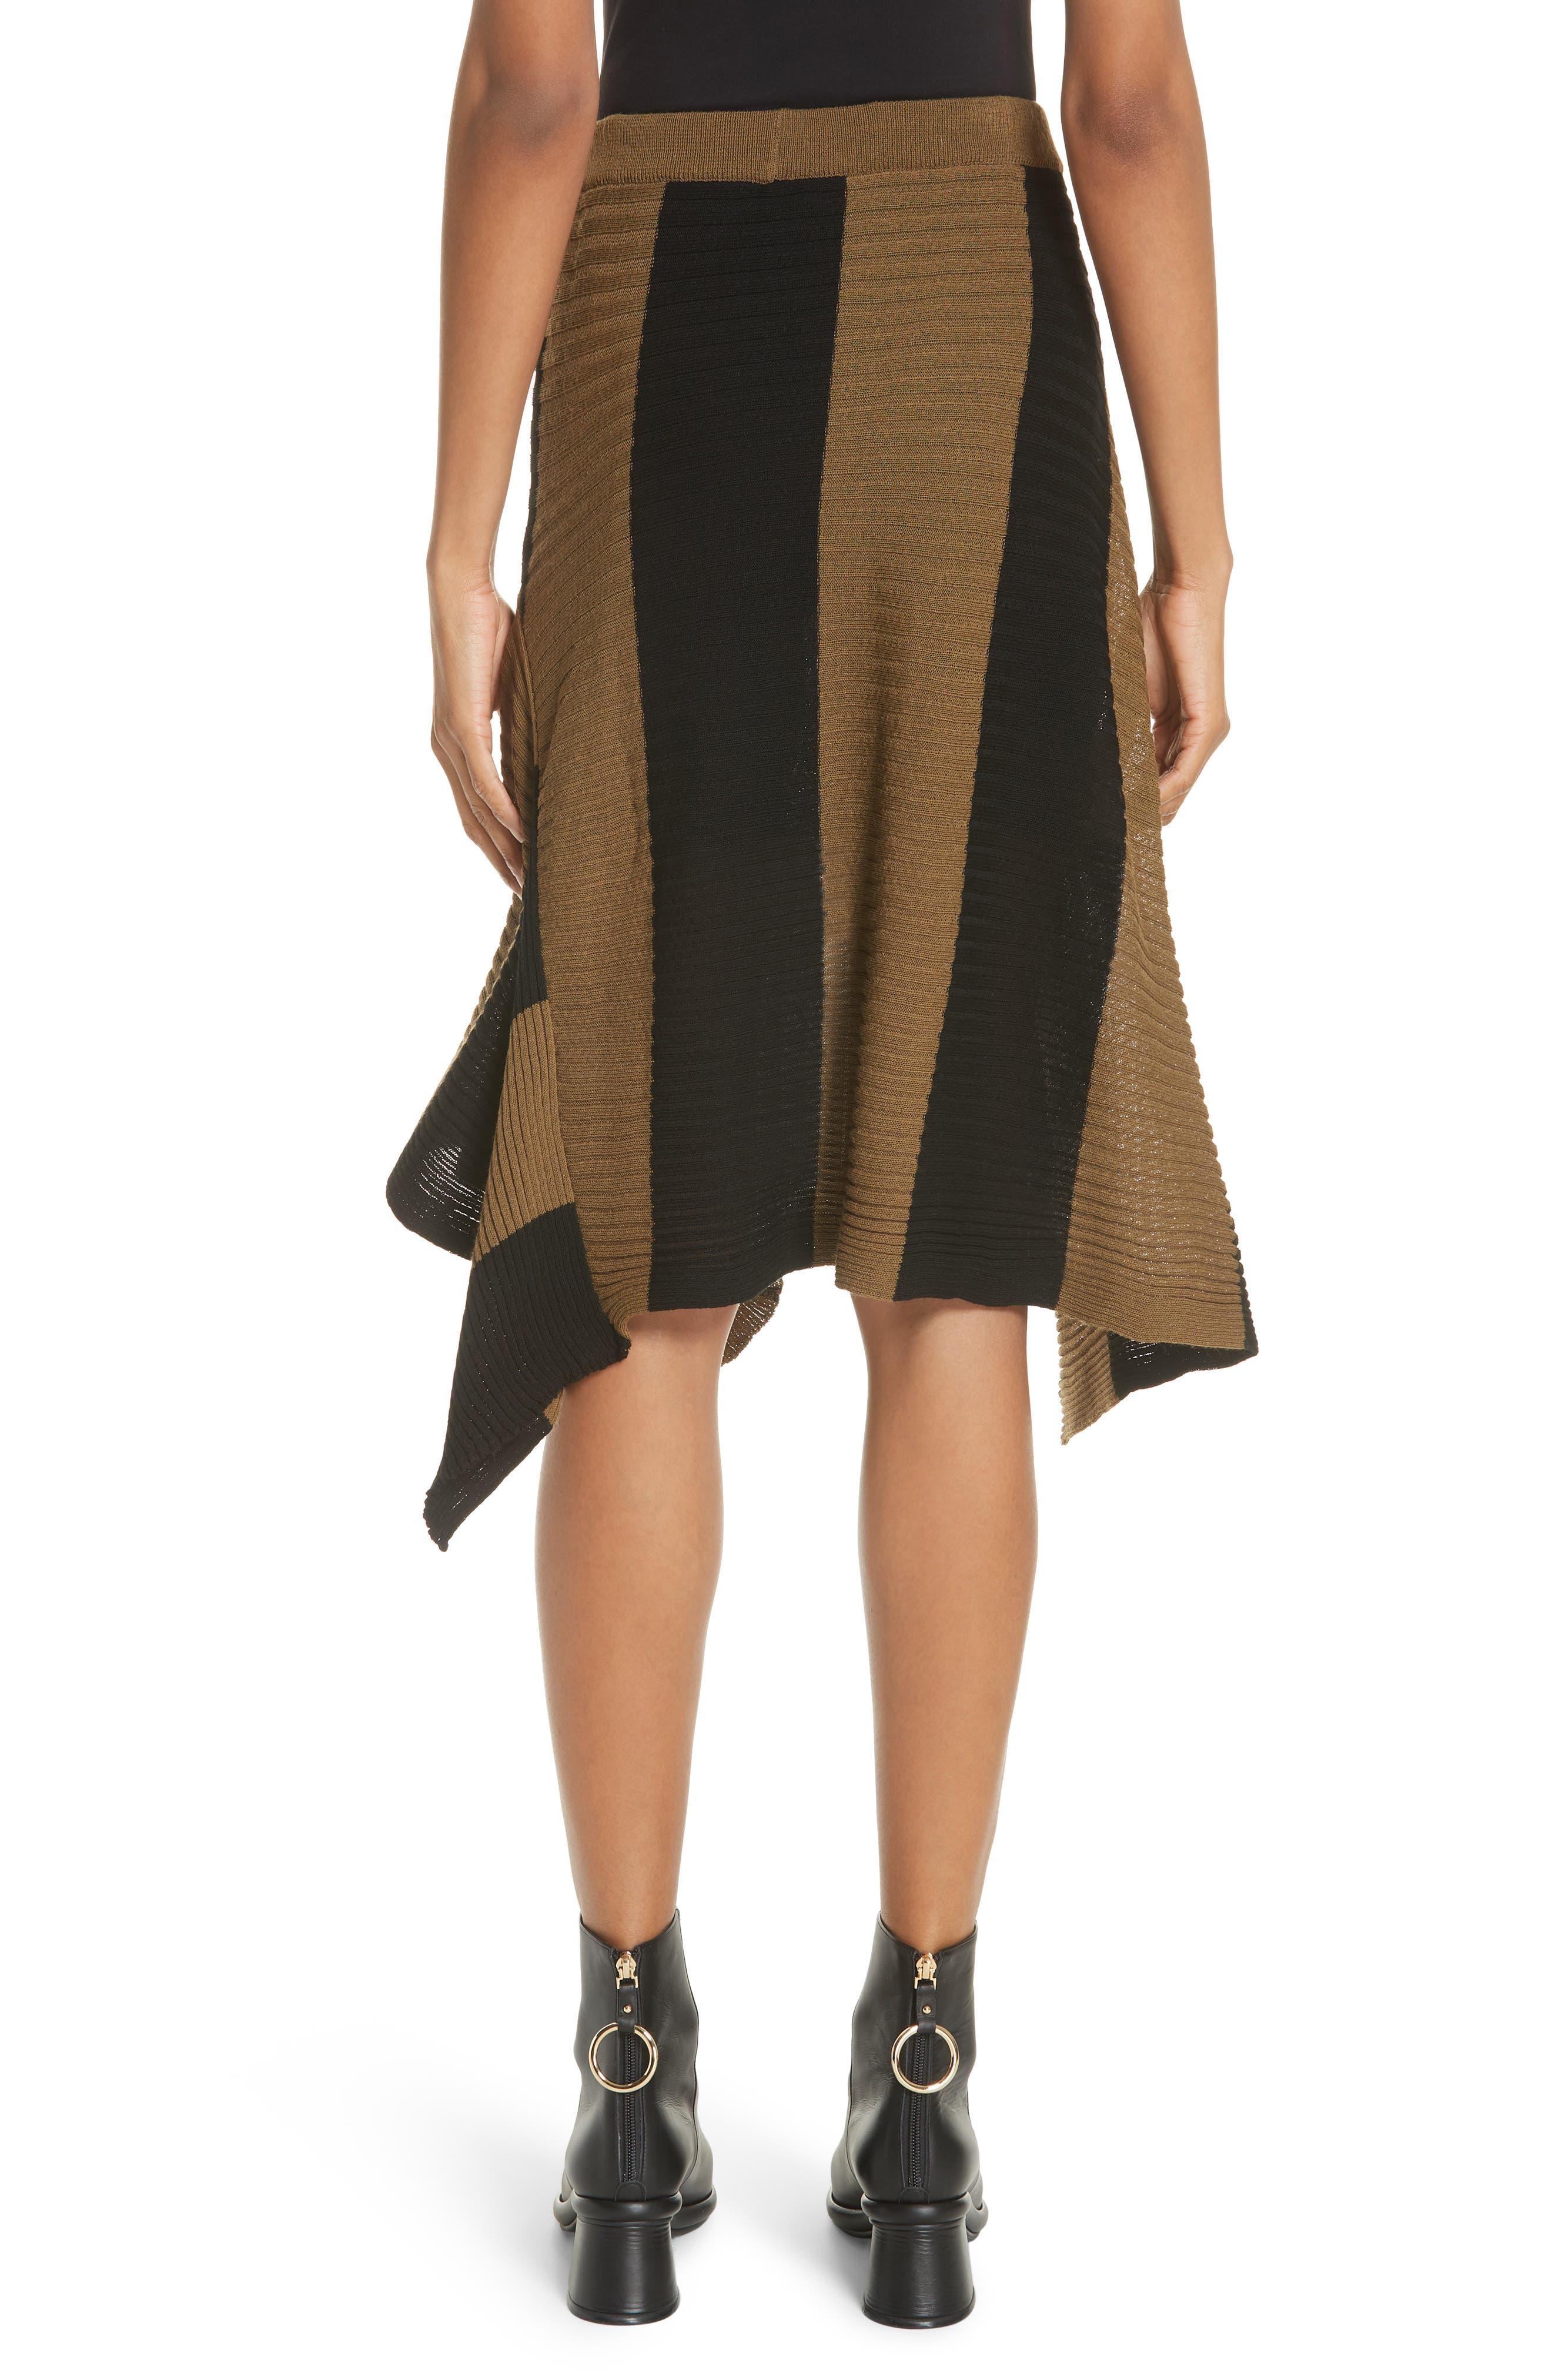 Marques'Almeida Draped Skirt,                             Alternate thumbnail 2, color,                             Khaki/ Black